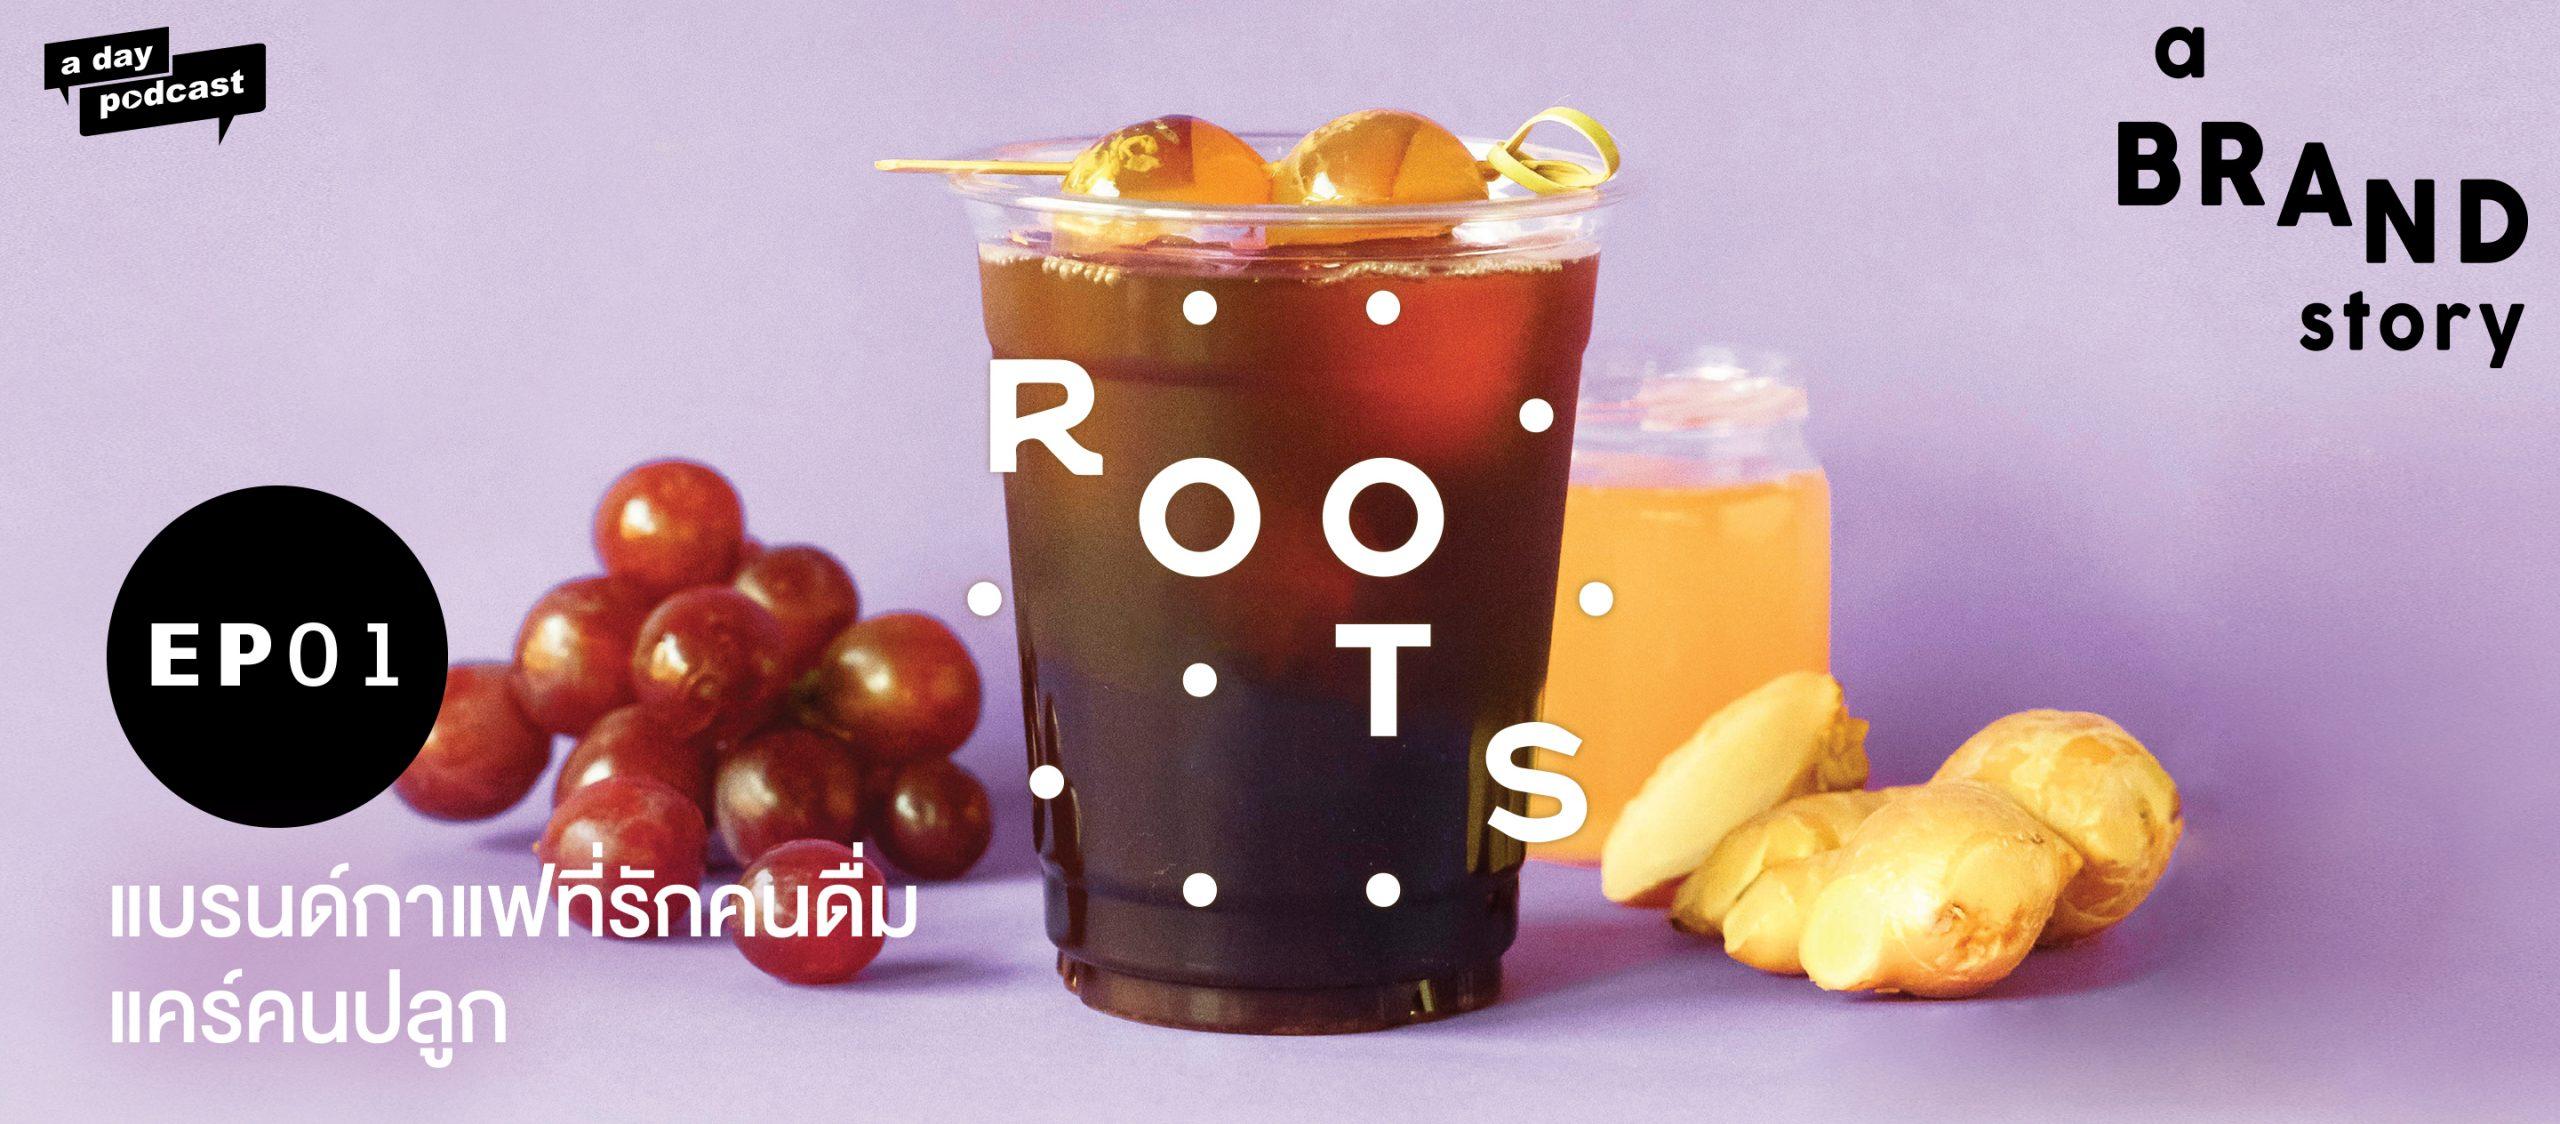 a BRAND story EP.01 Roots แบรนด์กาแฟที่รักคนดื่ม แคร์คนปลูก